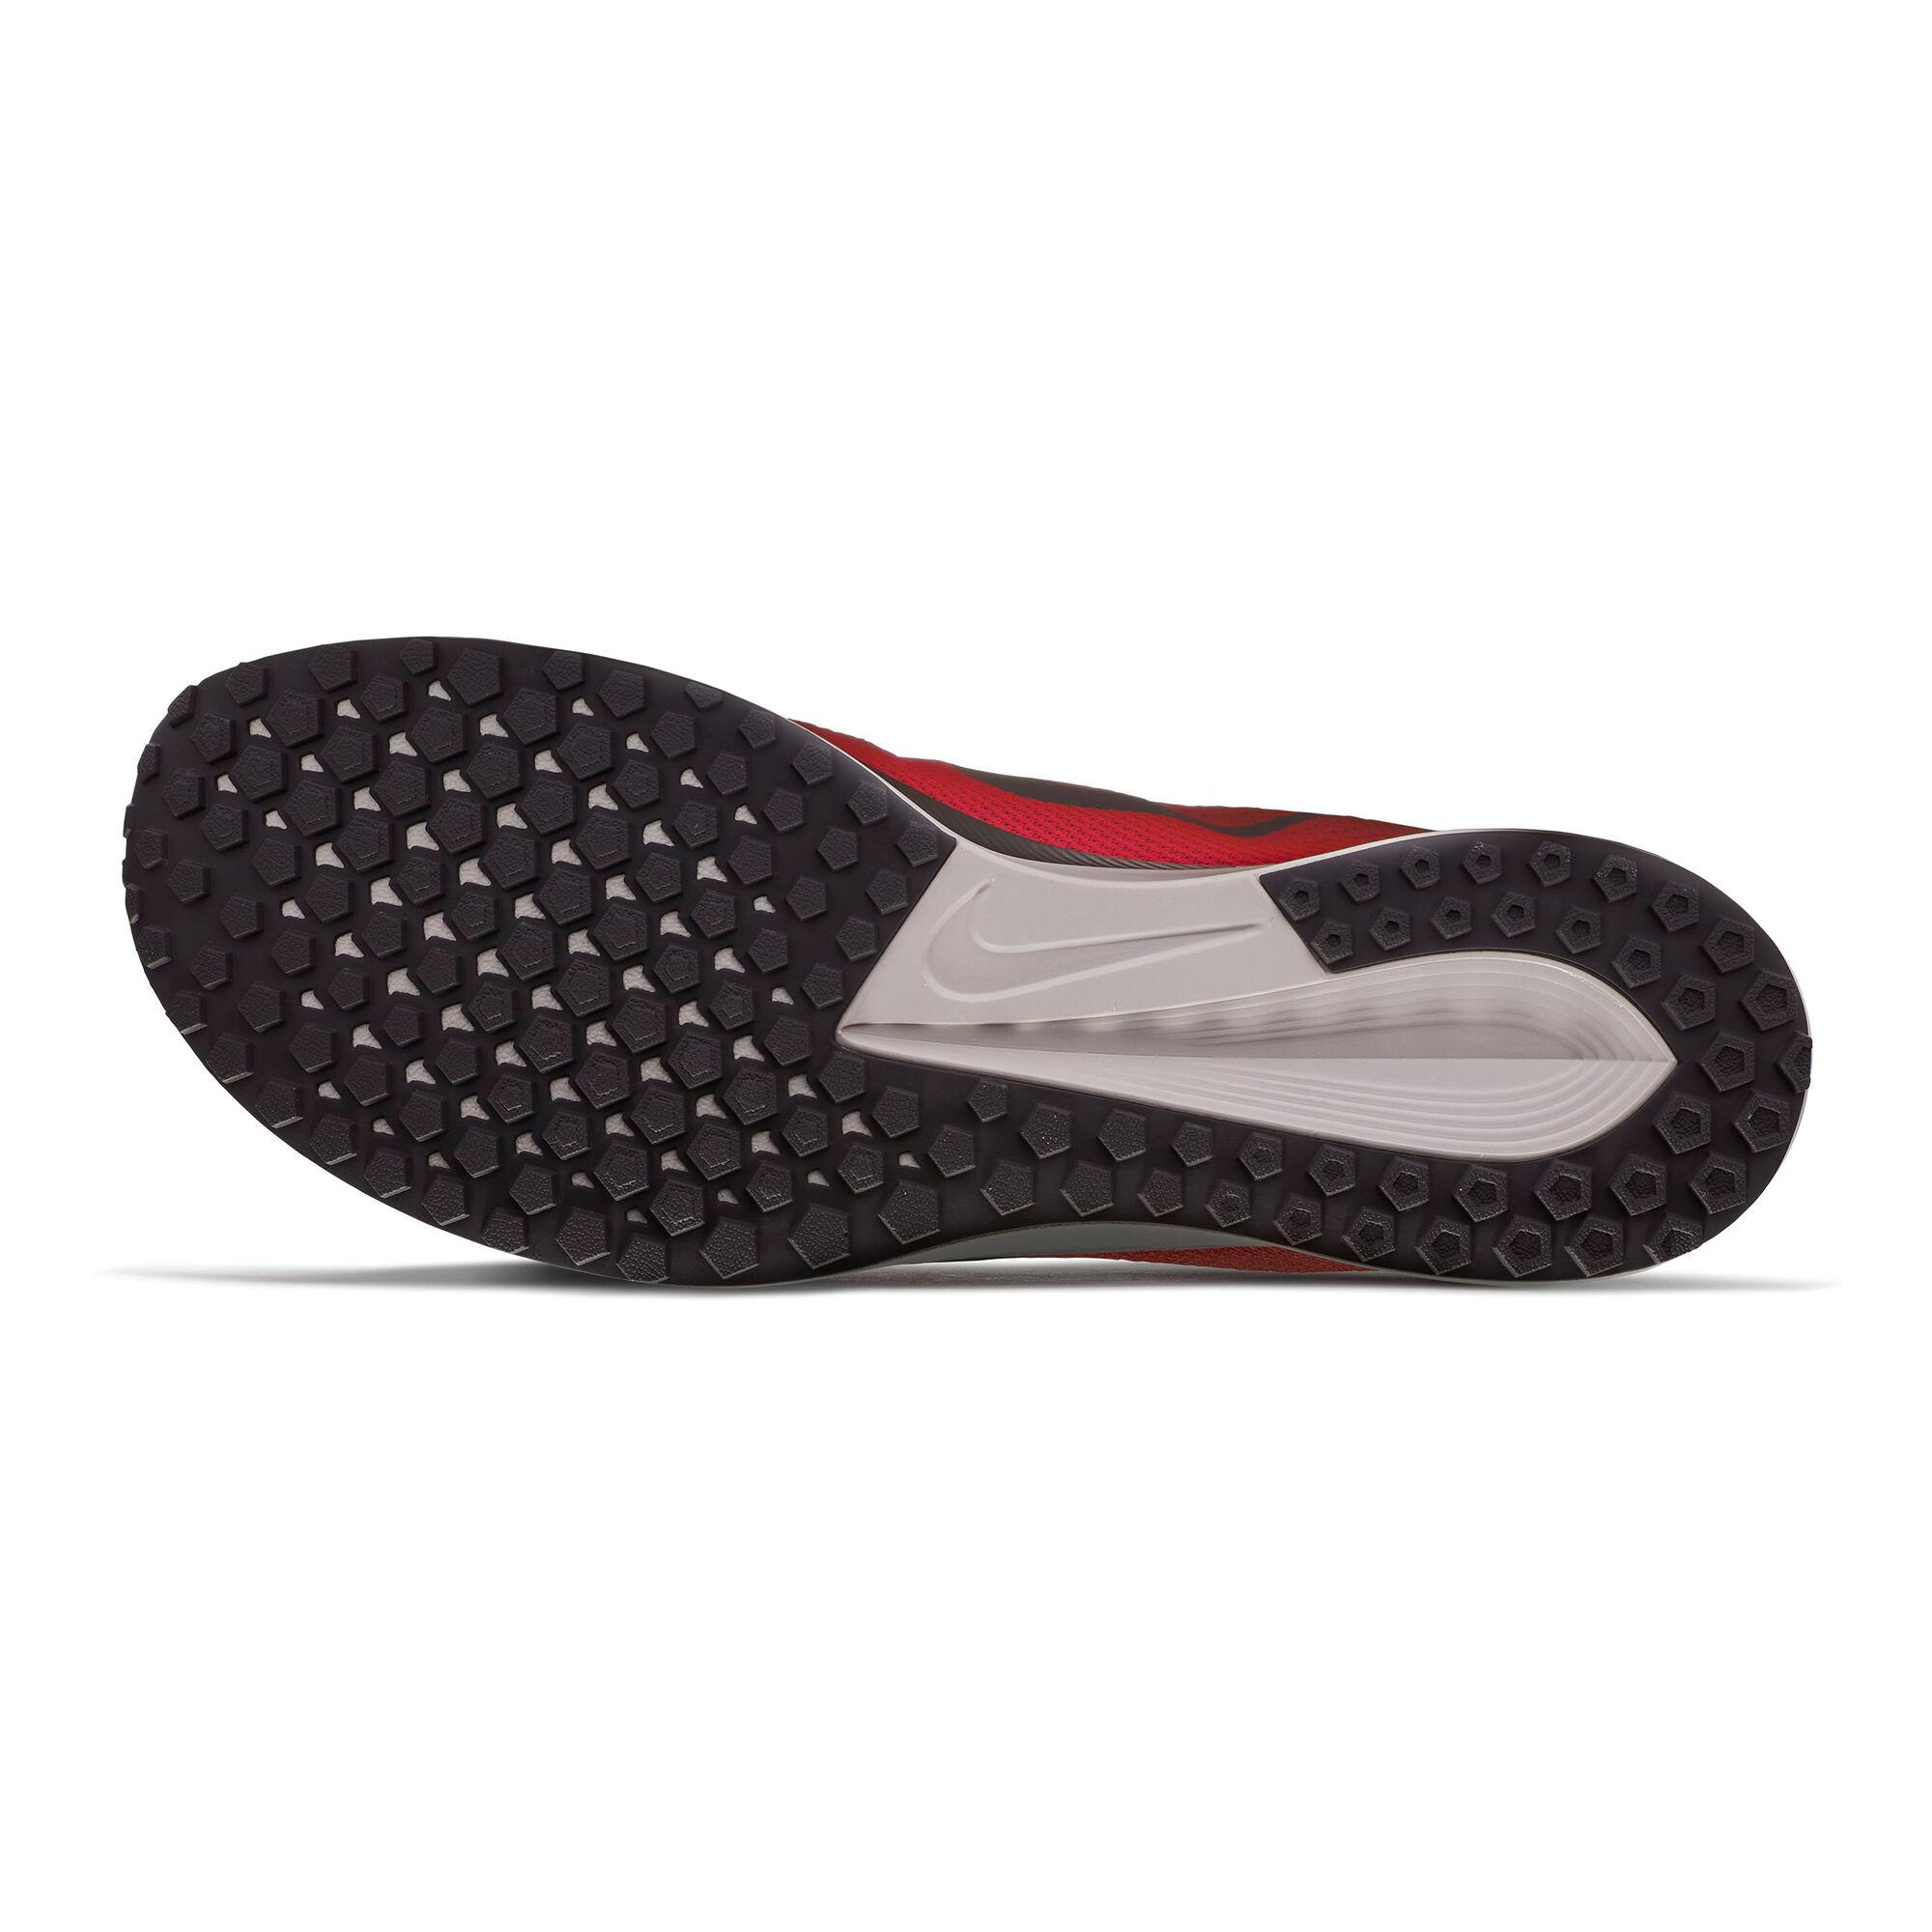 1b94f2afb3a03 buy Nike Air Zoom Elite 10 Neutral Running Shoe Men - Red